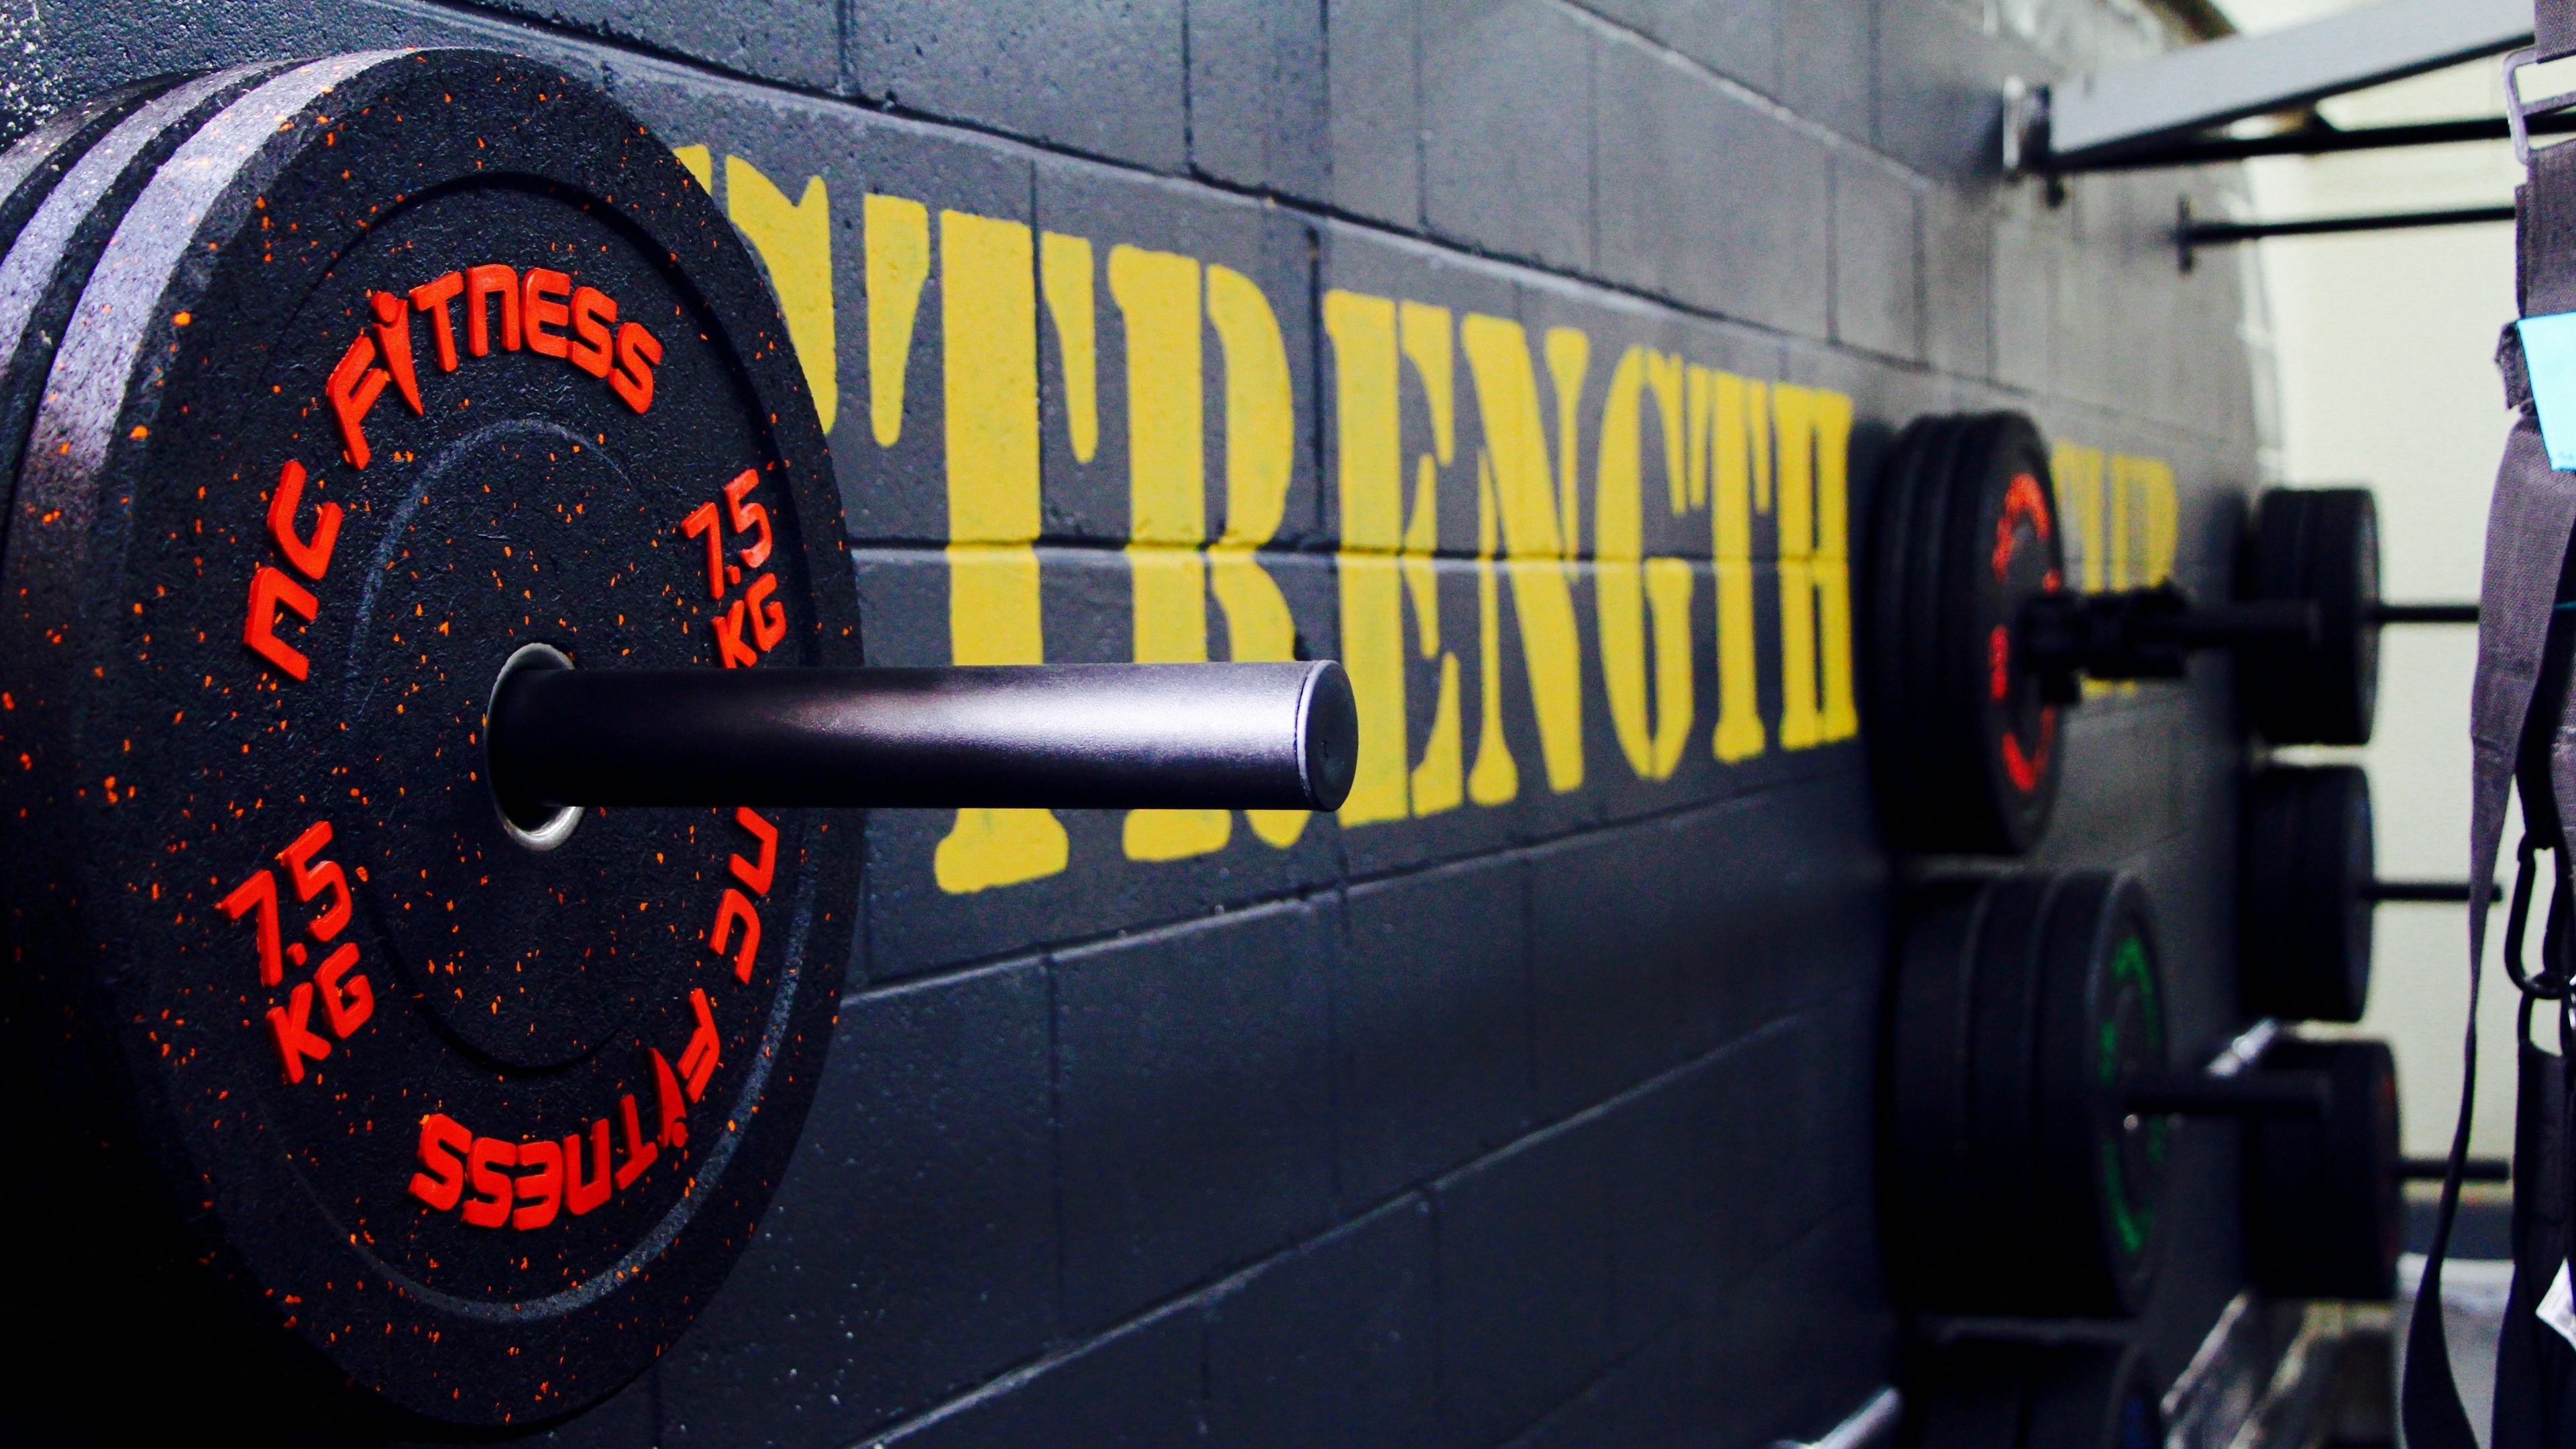 gym disks weight bodybuilding 4k 1540063069 - gym, disks, weight, bodybuilding 4k - weight, gym, disks